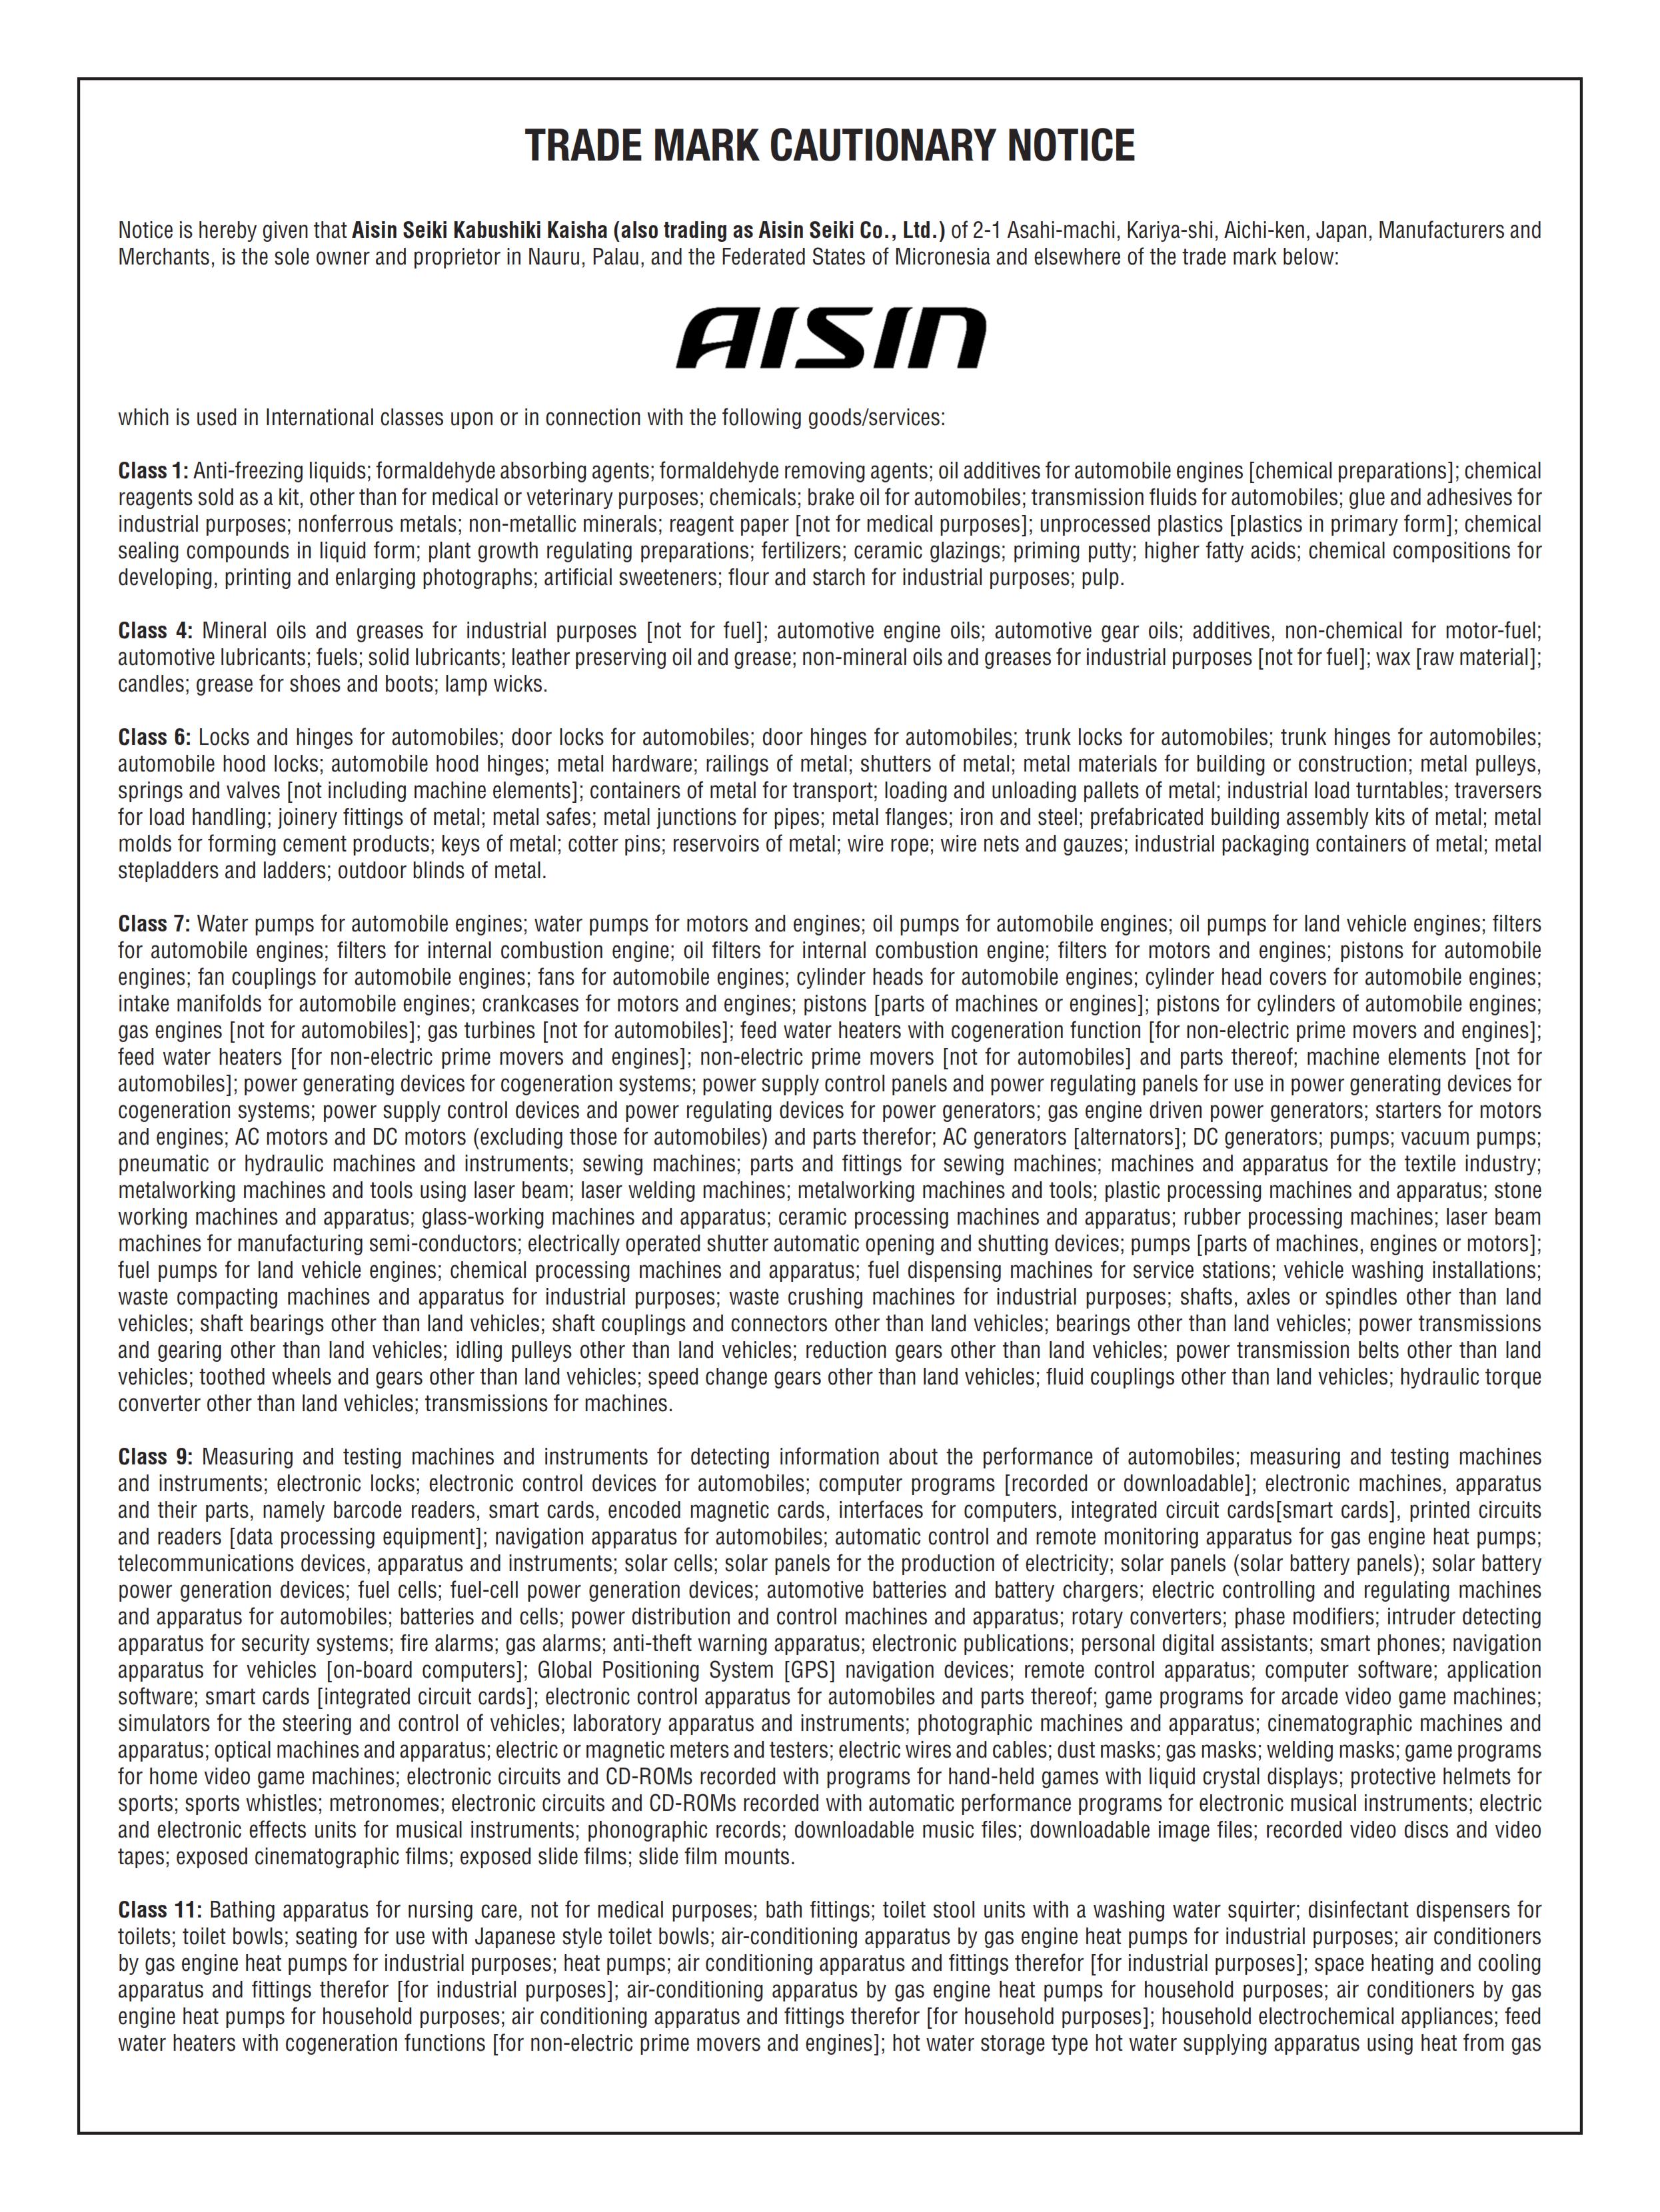 Cautionary Notice AISIN 3 001